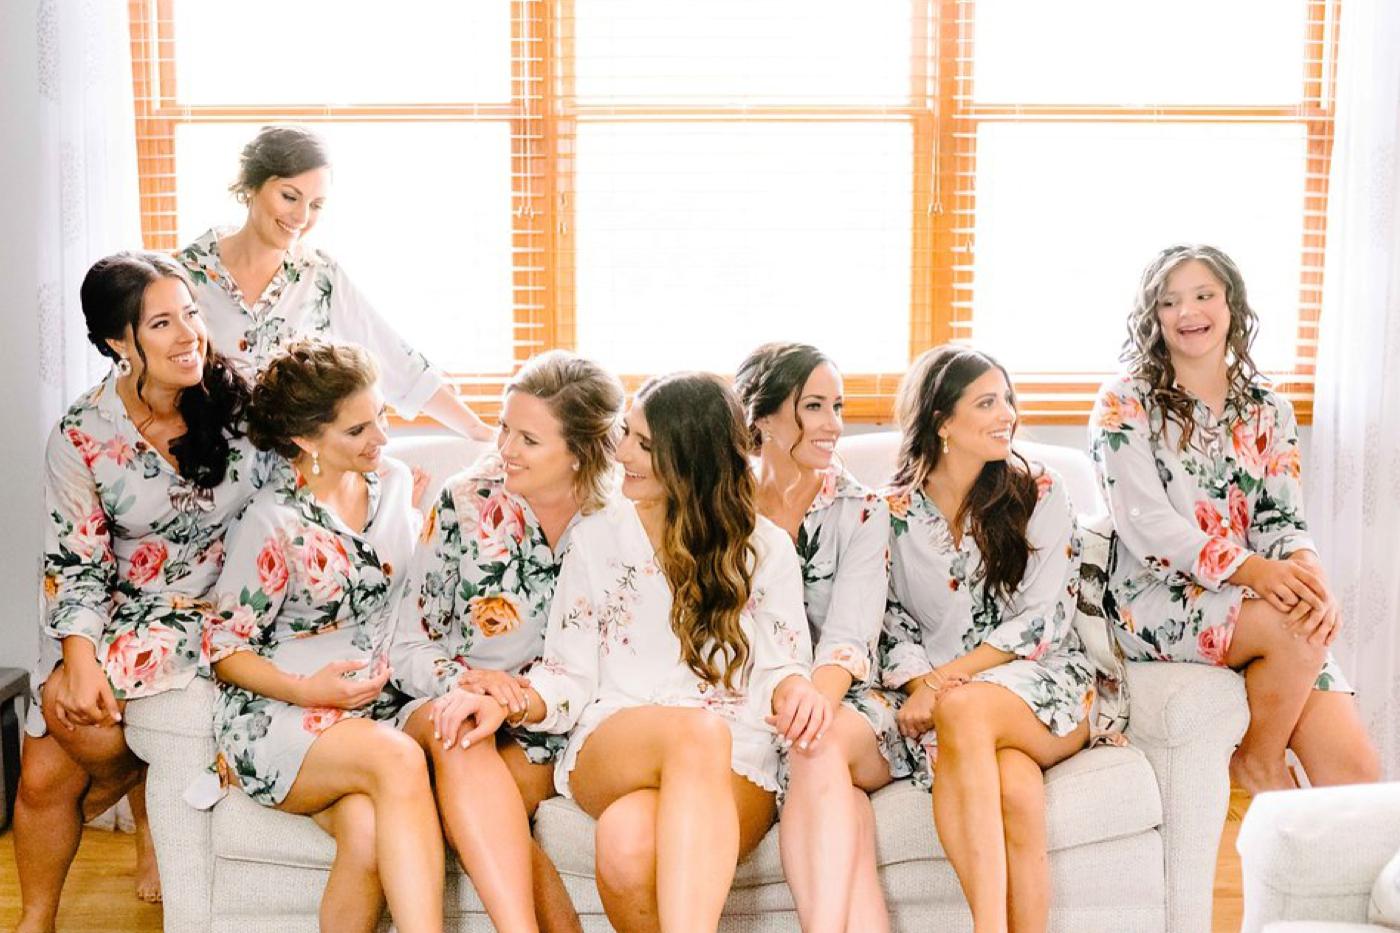 chicago-fine-art-wedding-photography-duncan4